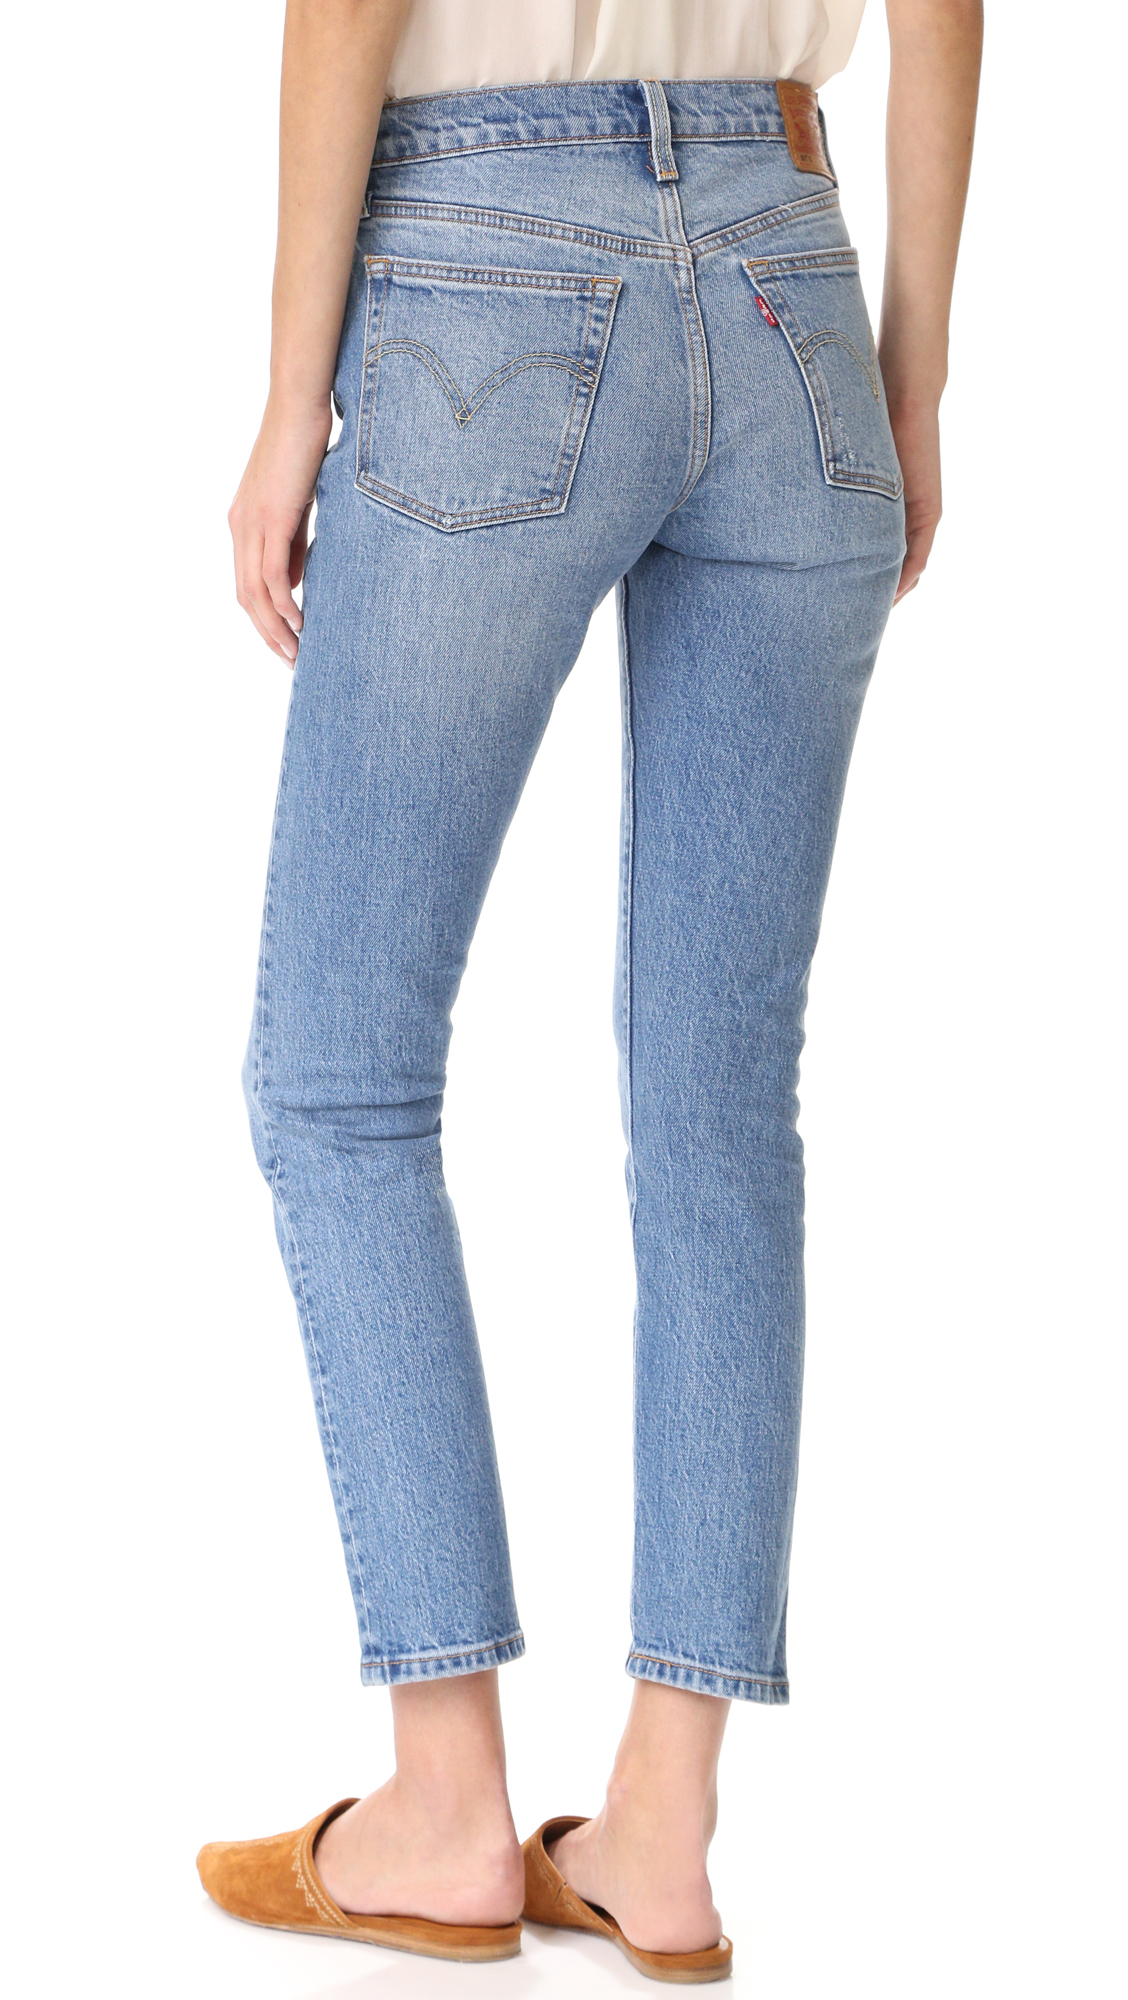 32b46e8fd26cf Levi s 501 Skinny Jeans